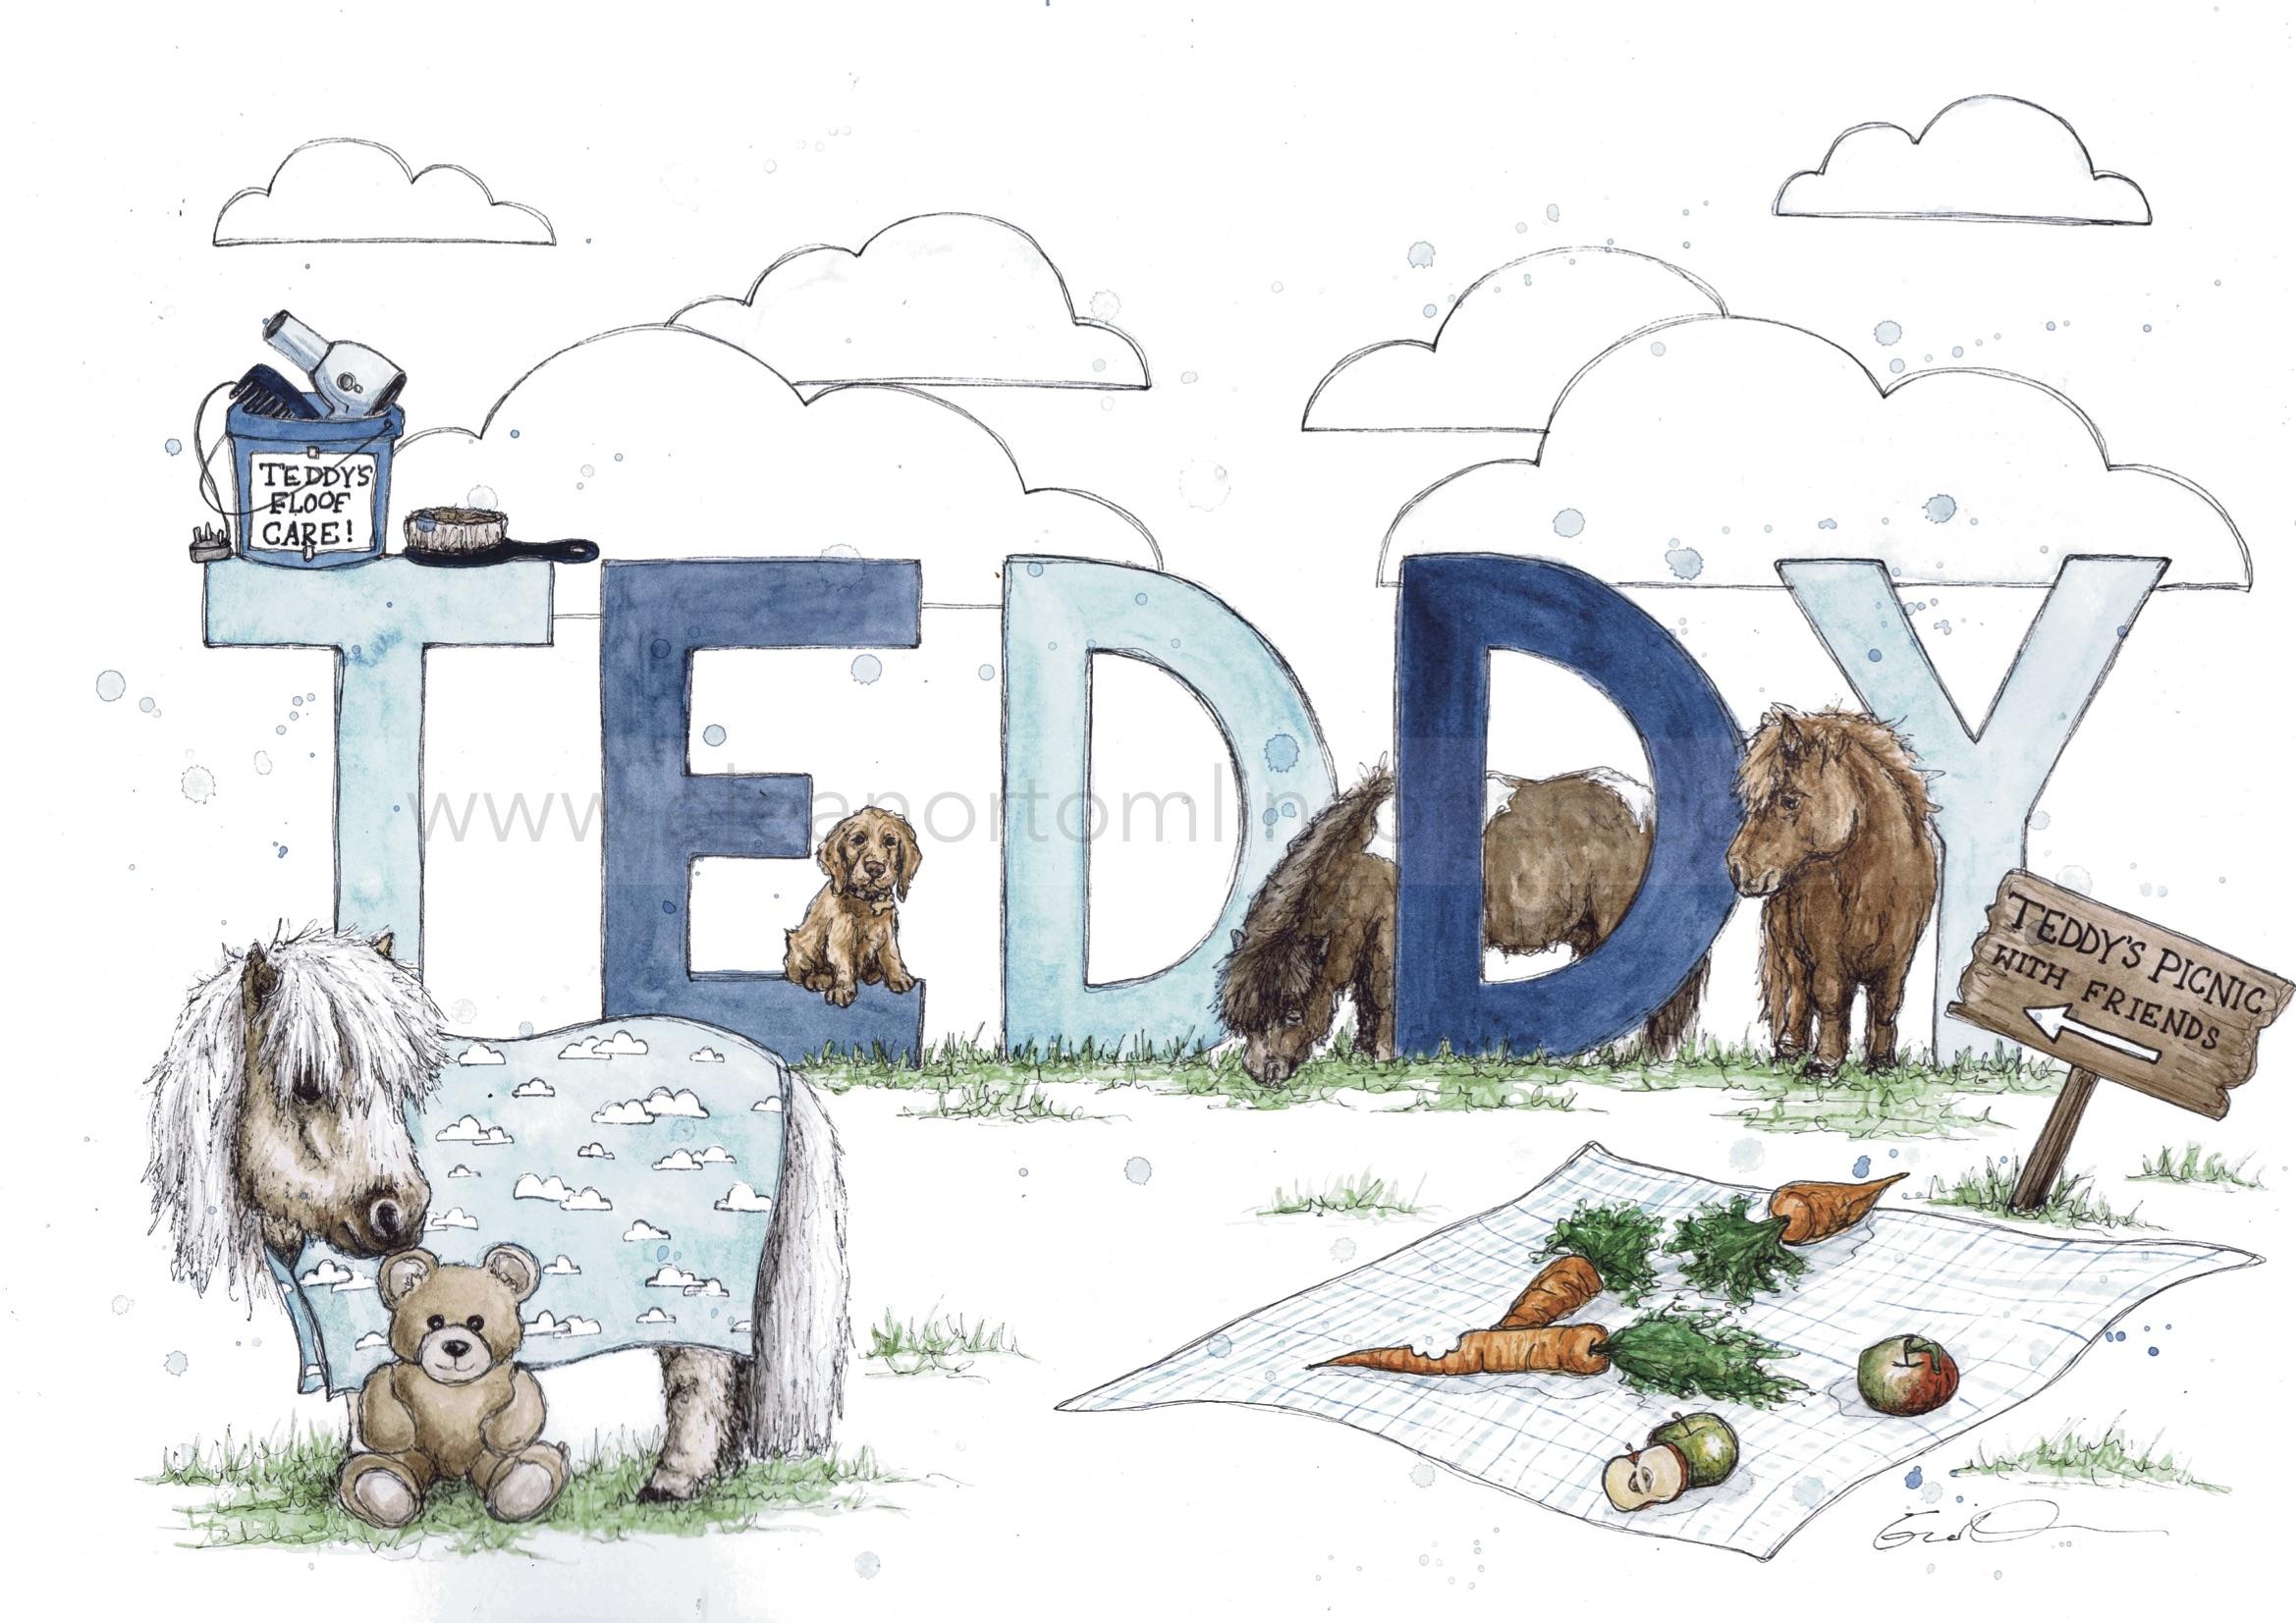 TEDDY THE SHETLAND